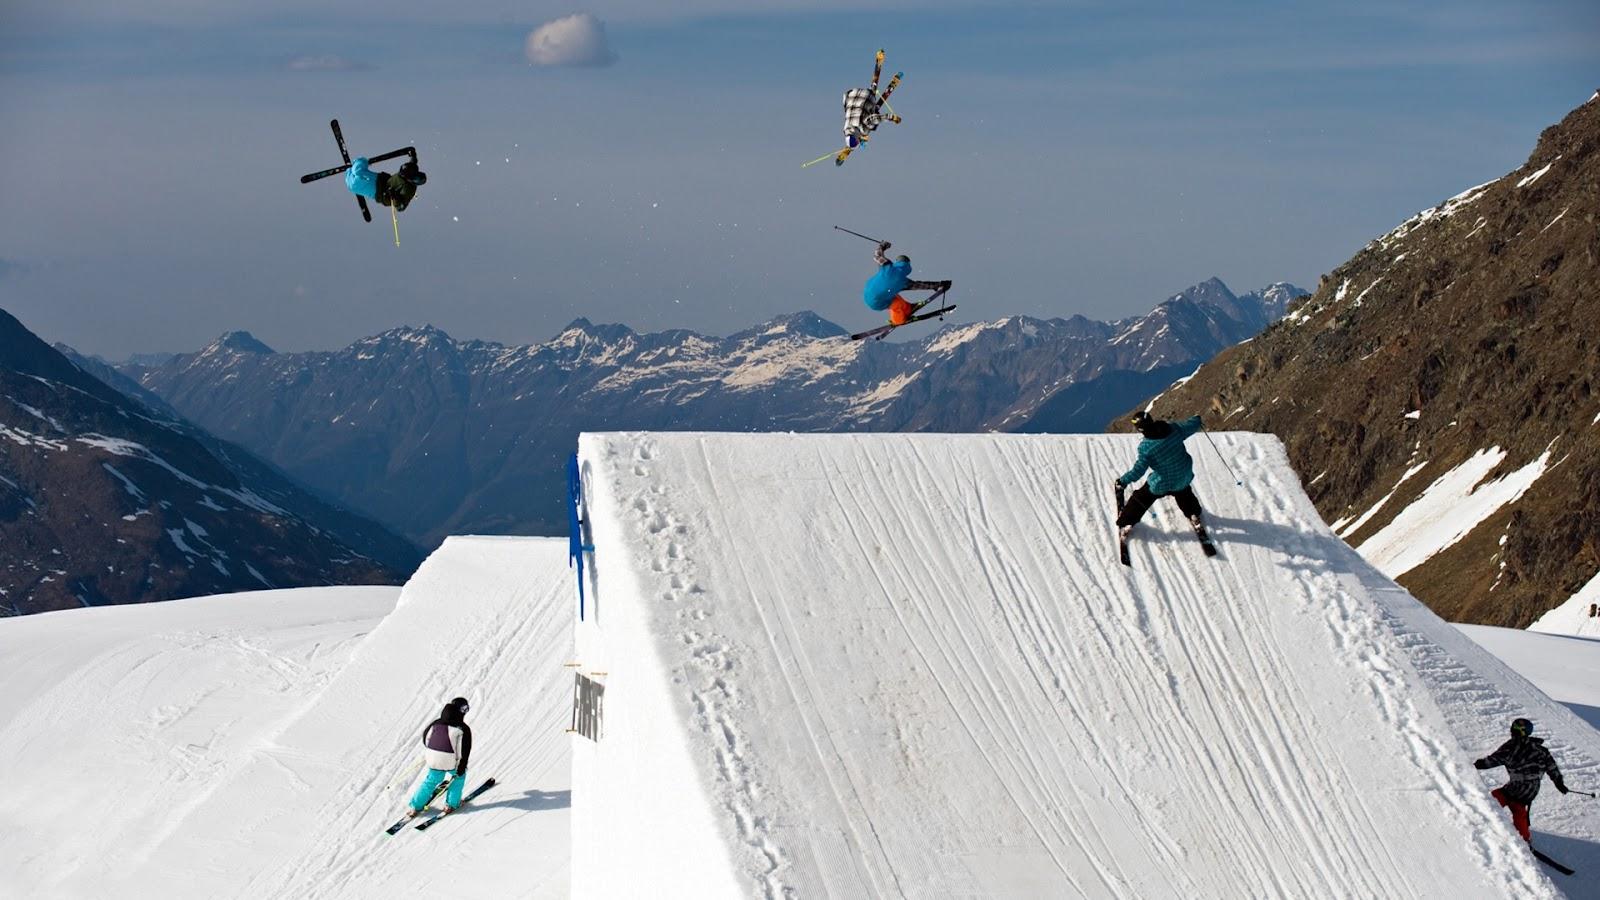 freestyle skiing wallpaper - photo #12